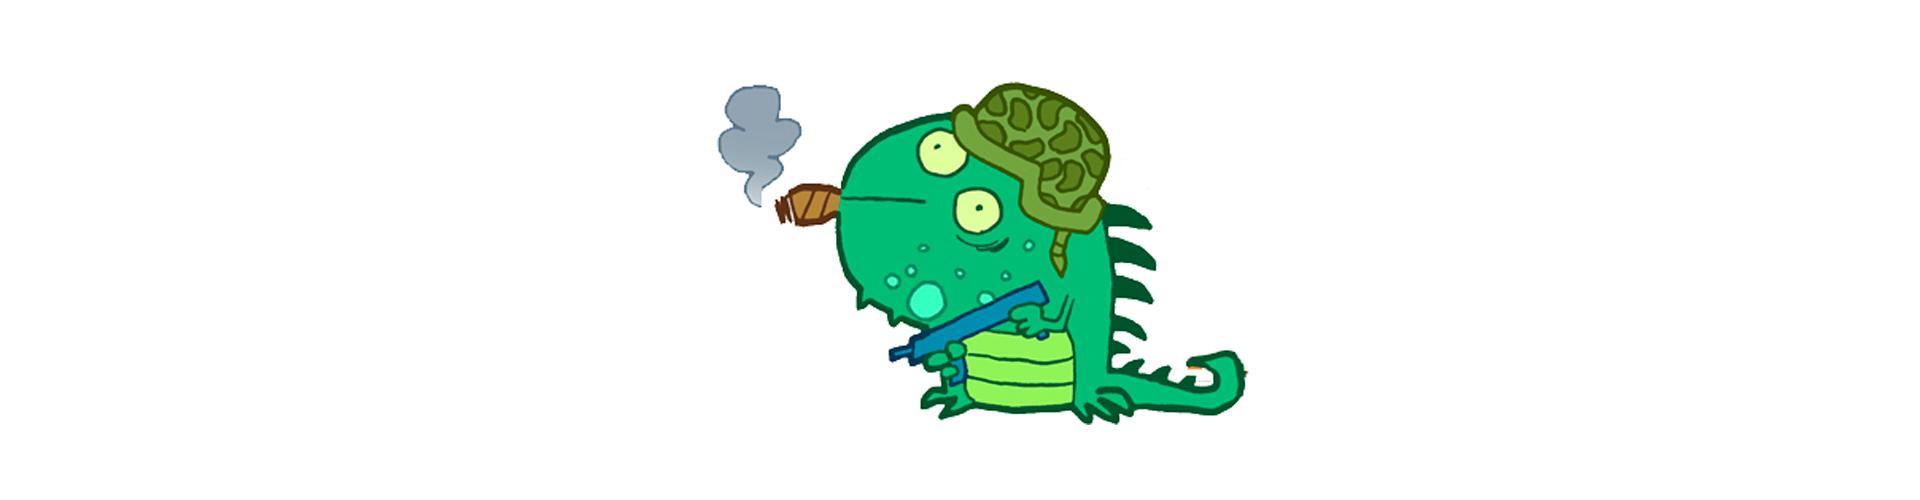 Iguanafire